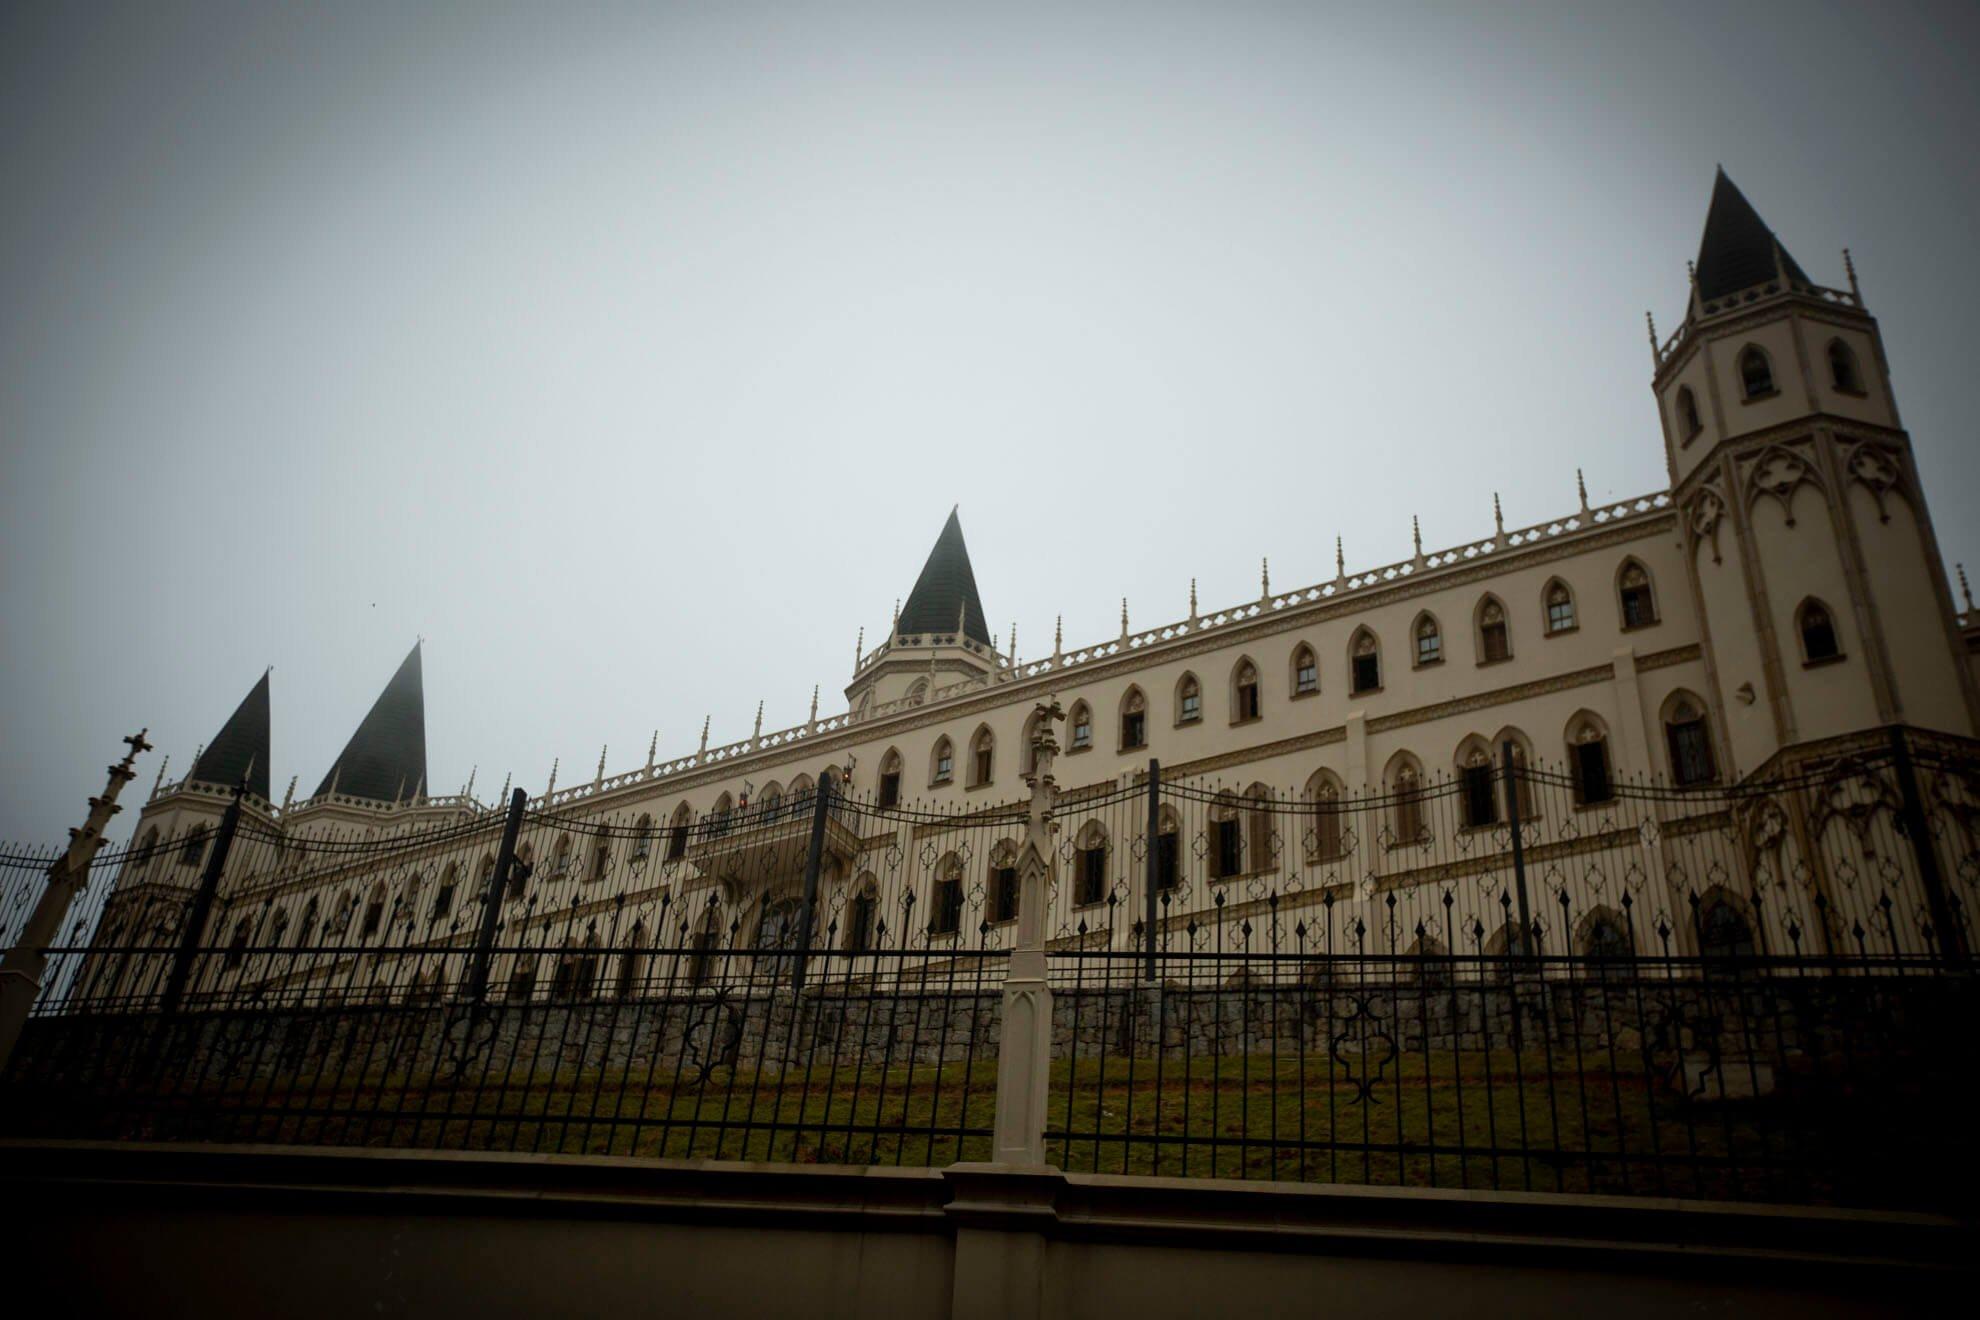 Só na unidade masculina de Caieiras, na Serra da Cantareira, estão confinados 150 garotos. Há ainda a casa das meninas, chamada Monte Carmelo